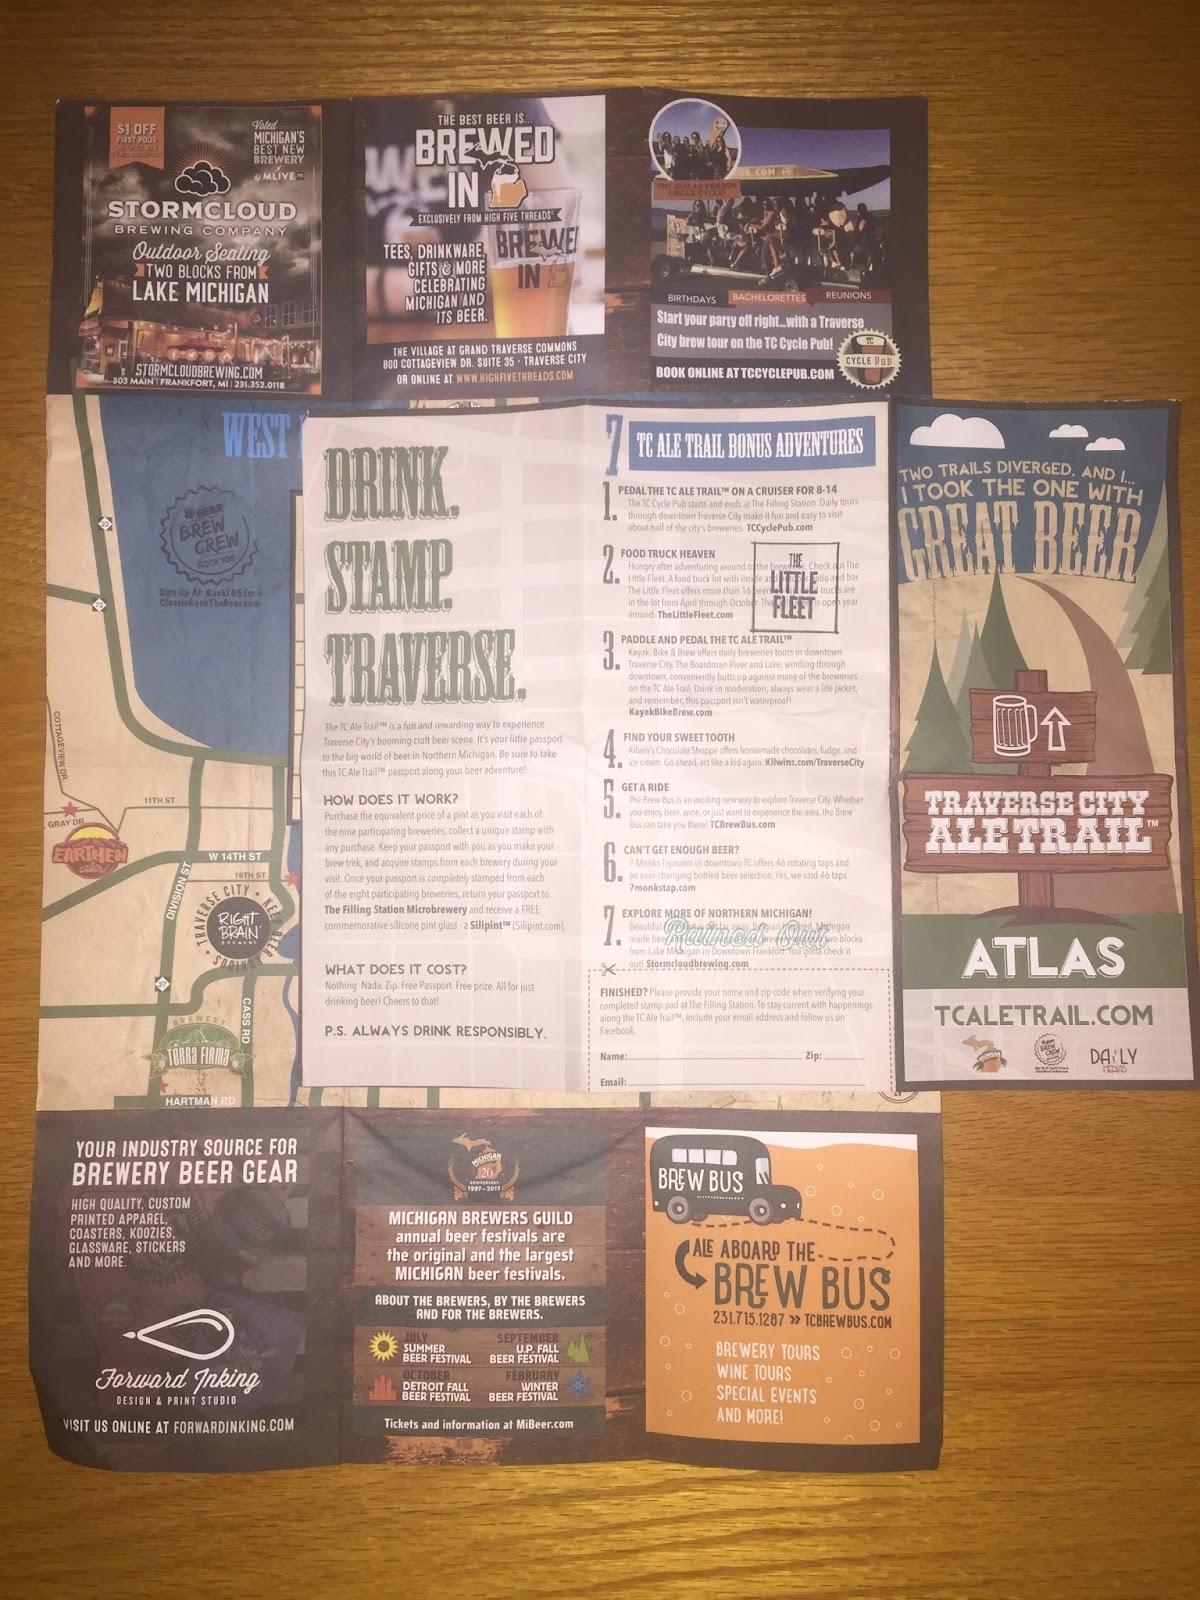 Travel Reviews & Information: Northern Michigan: Traverse City, Lake